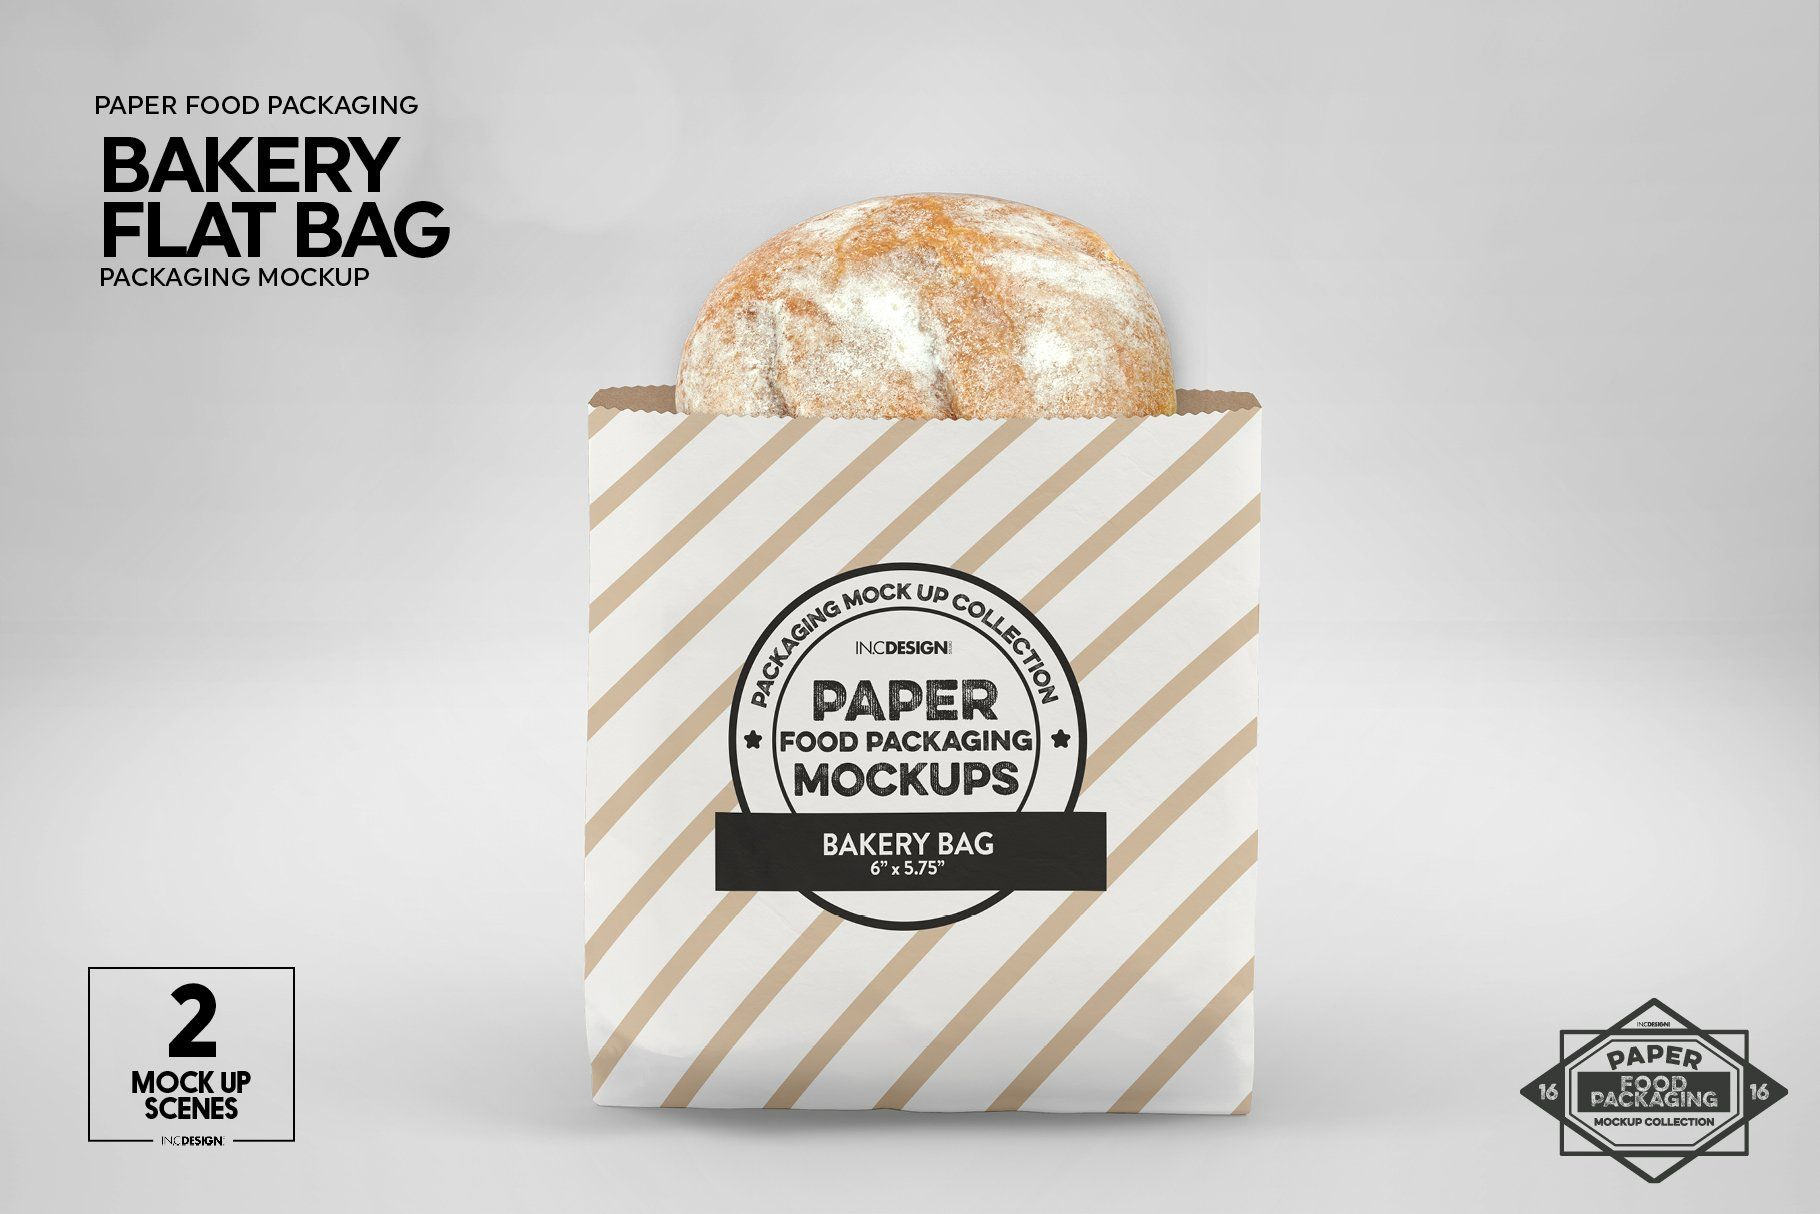 Download Flat Bakery Bags Packaging Mockup Bakery Bags Food Box Packaging Packaging Mockup